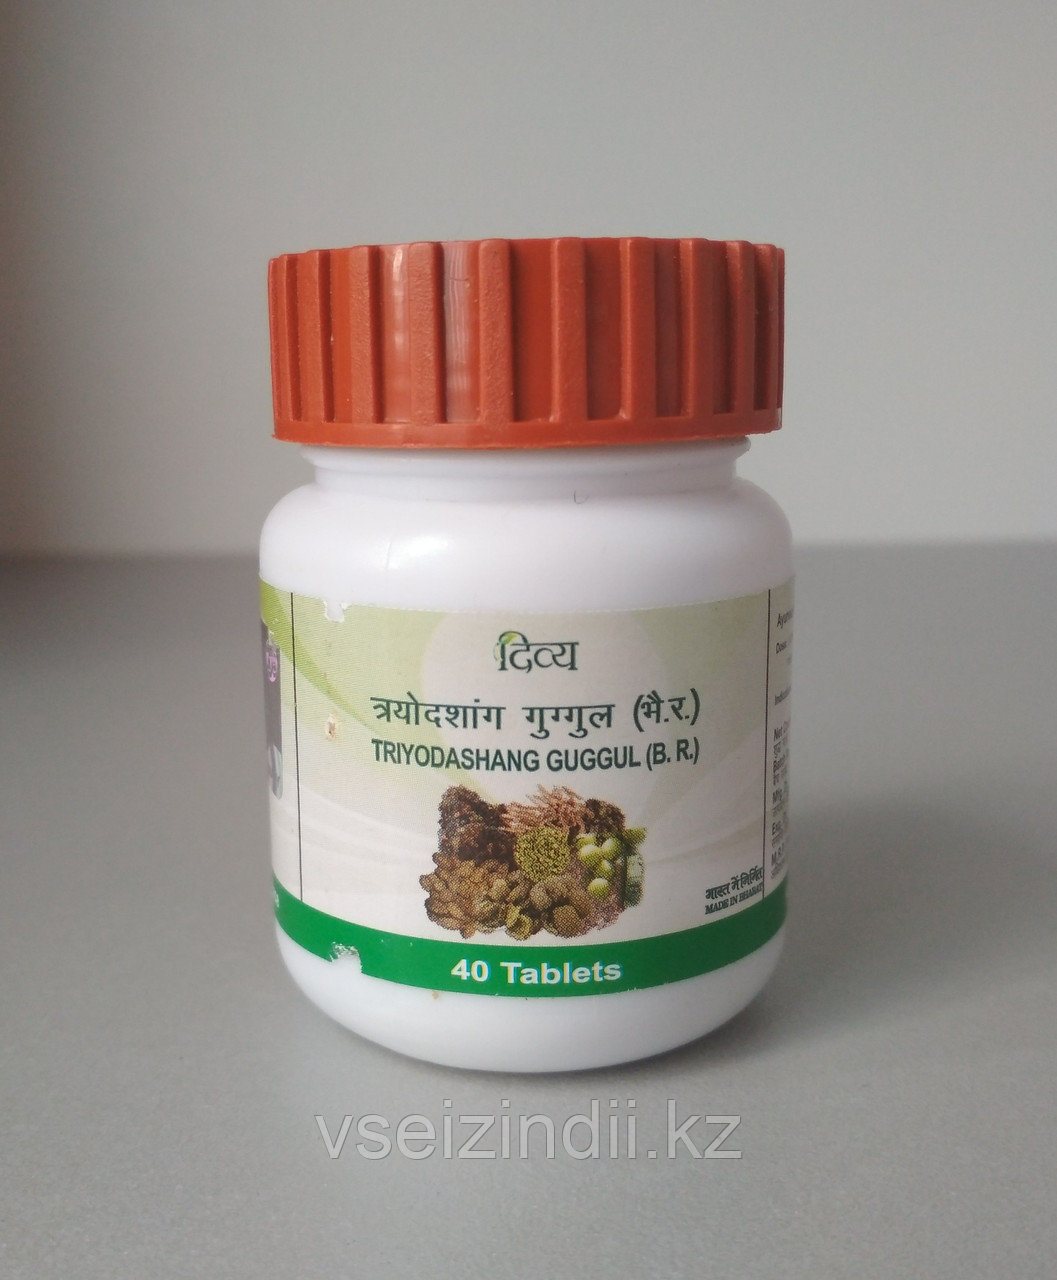 Трайодашанг гуггул, Дивья/ Triyodashang guggul, 40 таблеток